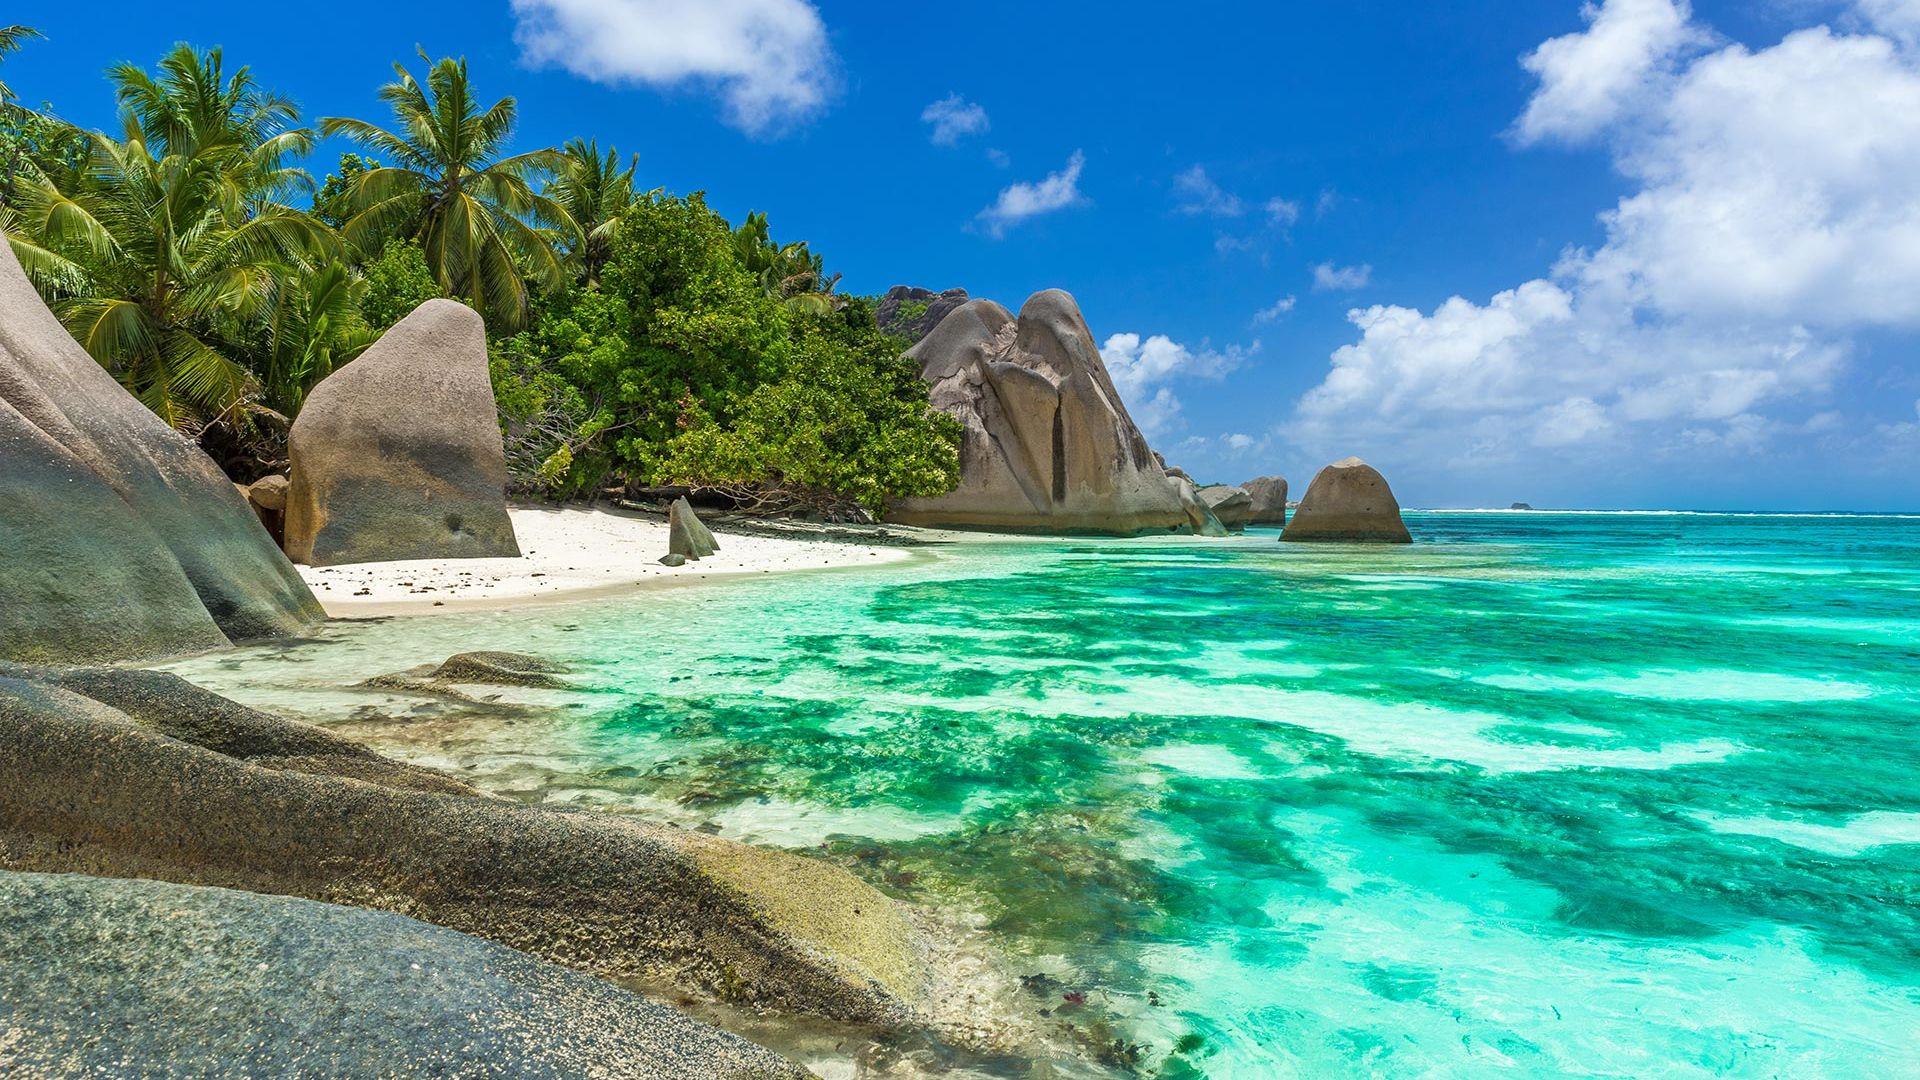 Sejur plaja Mahe & Praslin, Seychelles, 10 zile - august 2021